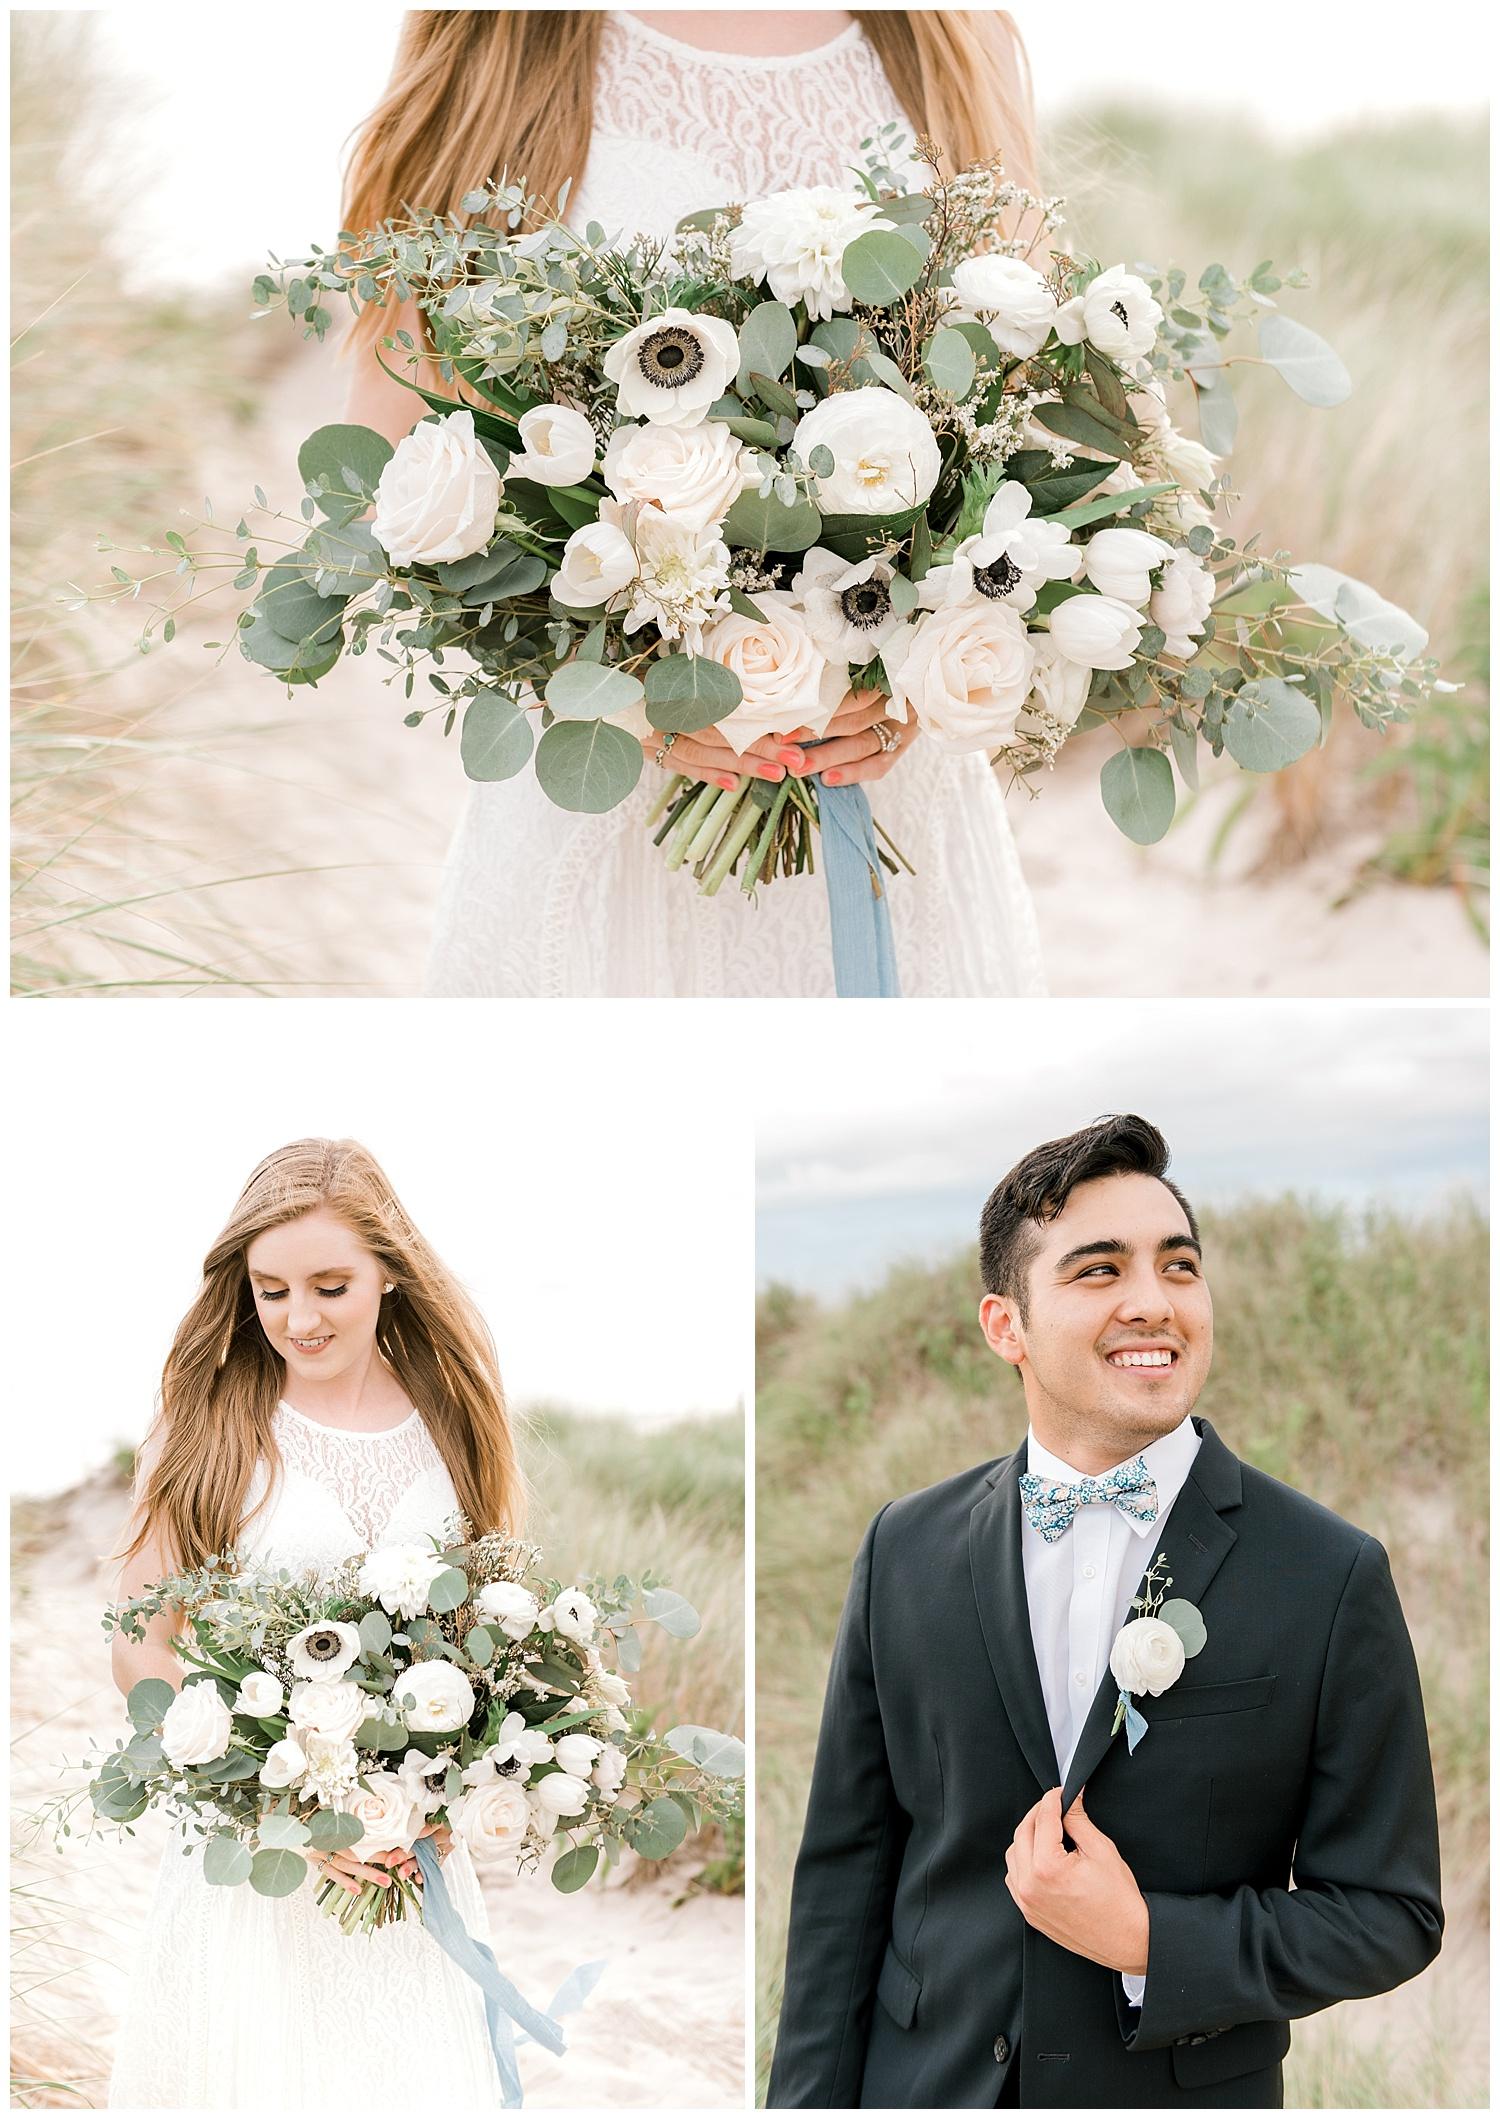 island-nappatree-point-wedding-photography-5.jpg